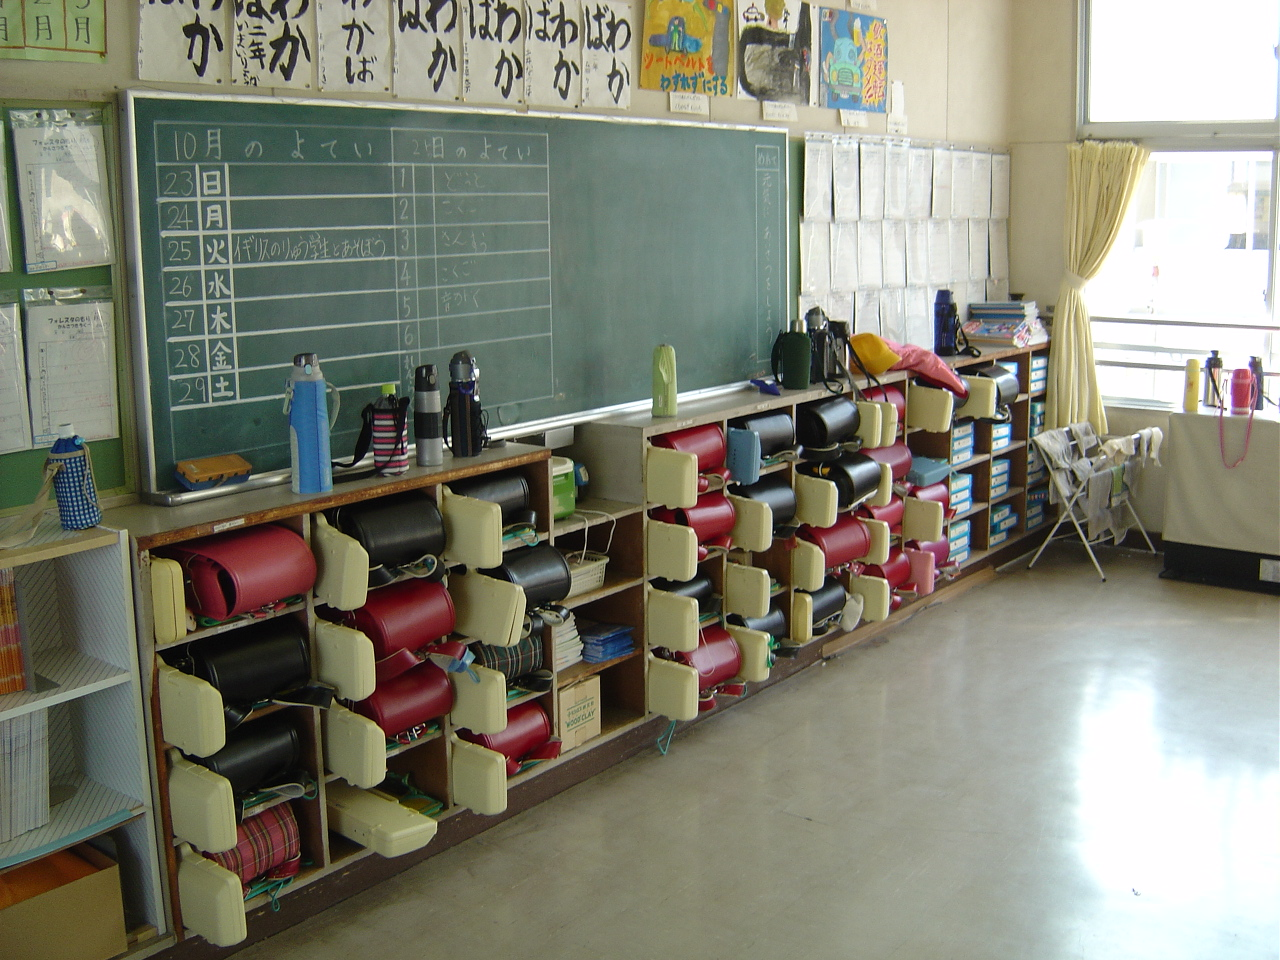 Japanese Elementary School Classroom : 漢字 小学校 : 小学校